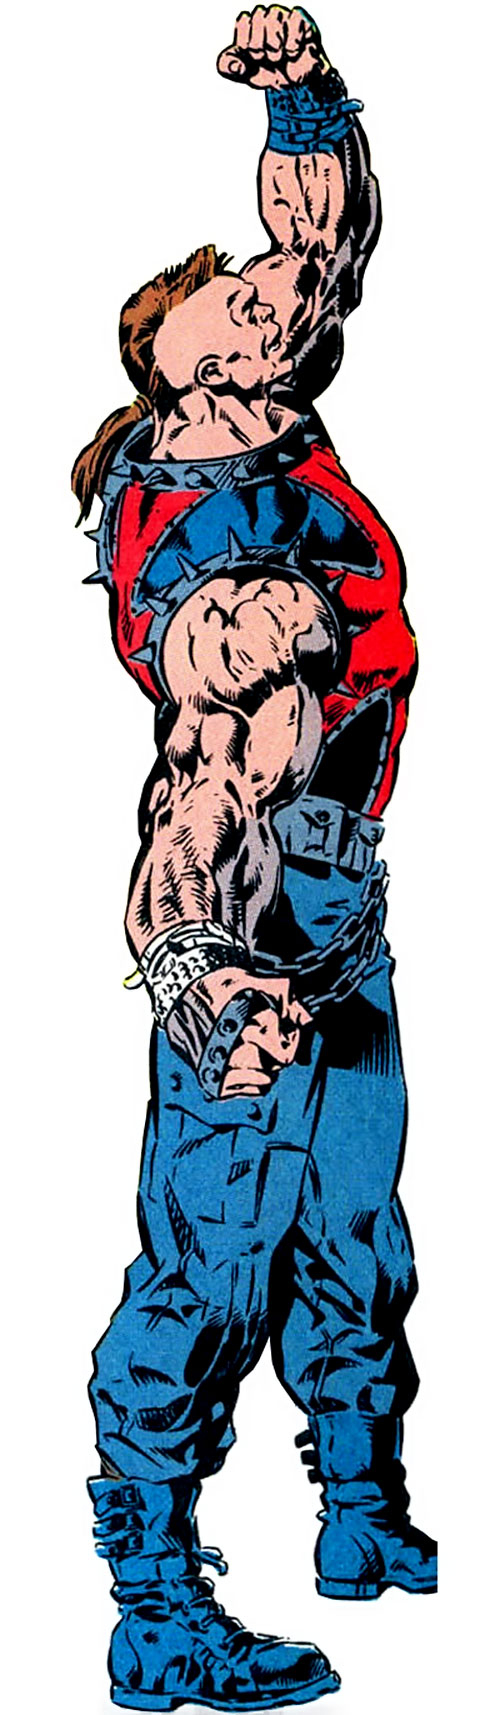 Iron Cross of the Cadre / Aryan Brigade (JLA enemy) (DC Comics)